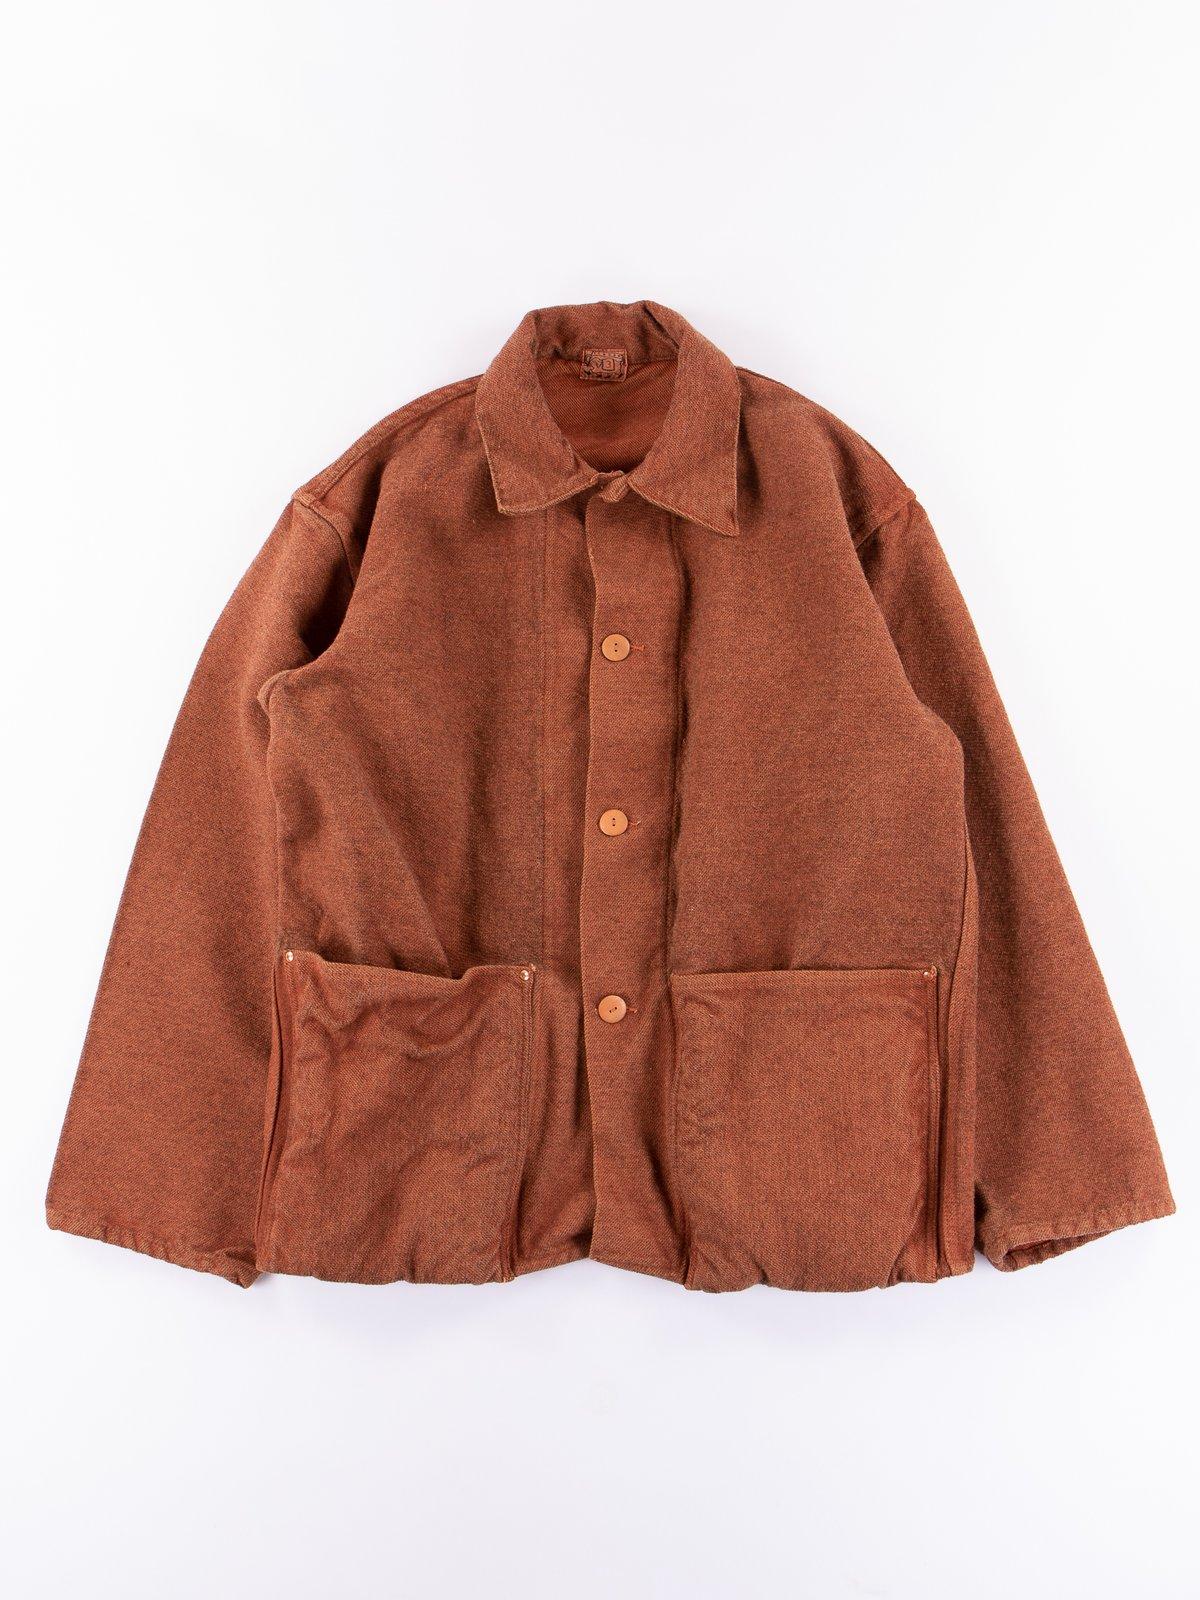 Red Ochre Dye Collared Shepherd's Coat - Image 1